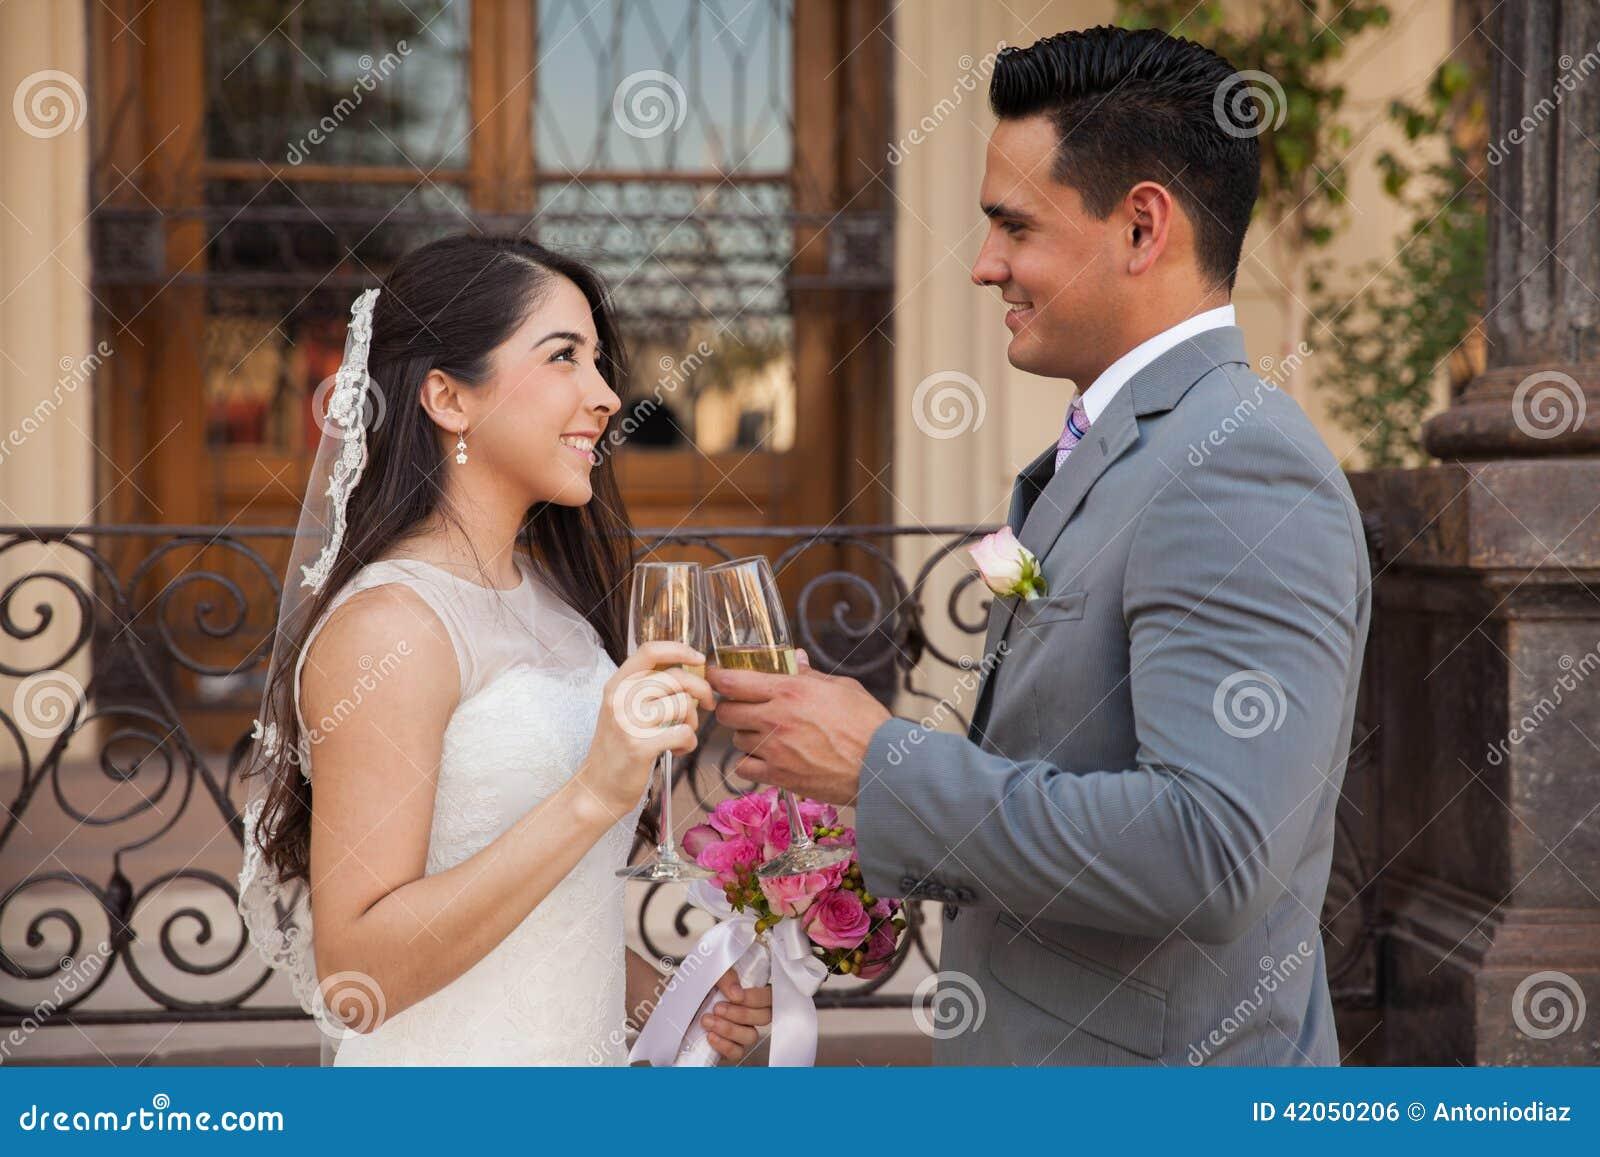 Making A Toast On Their Wedding Stock Photo